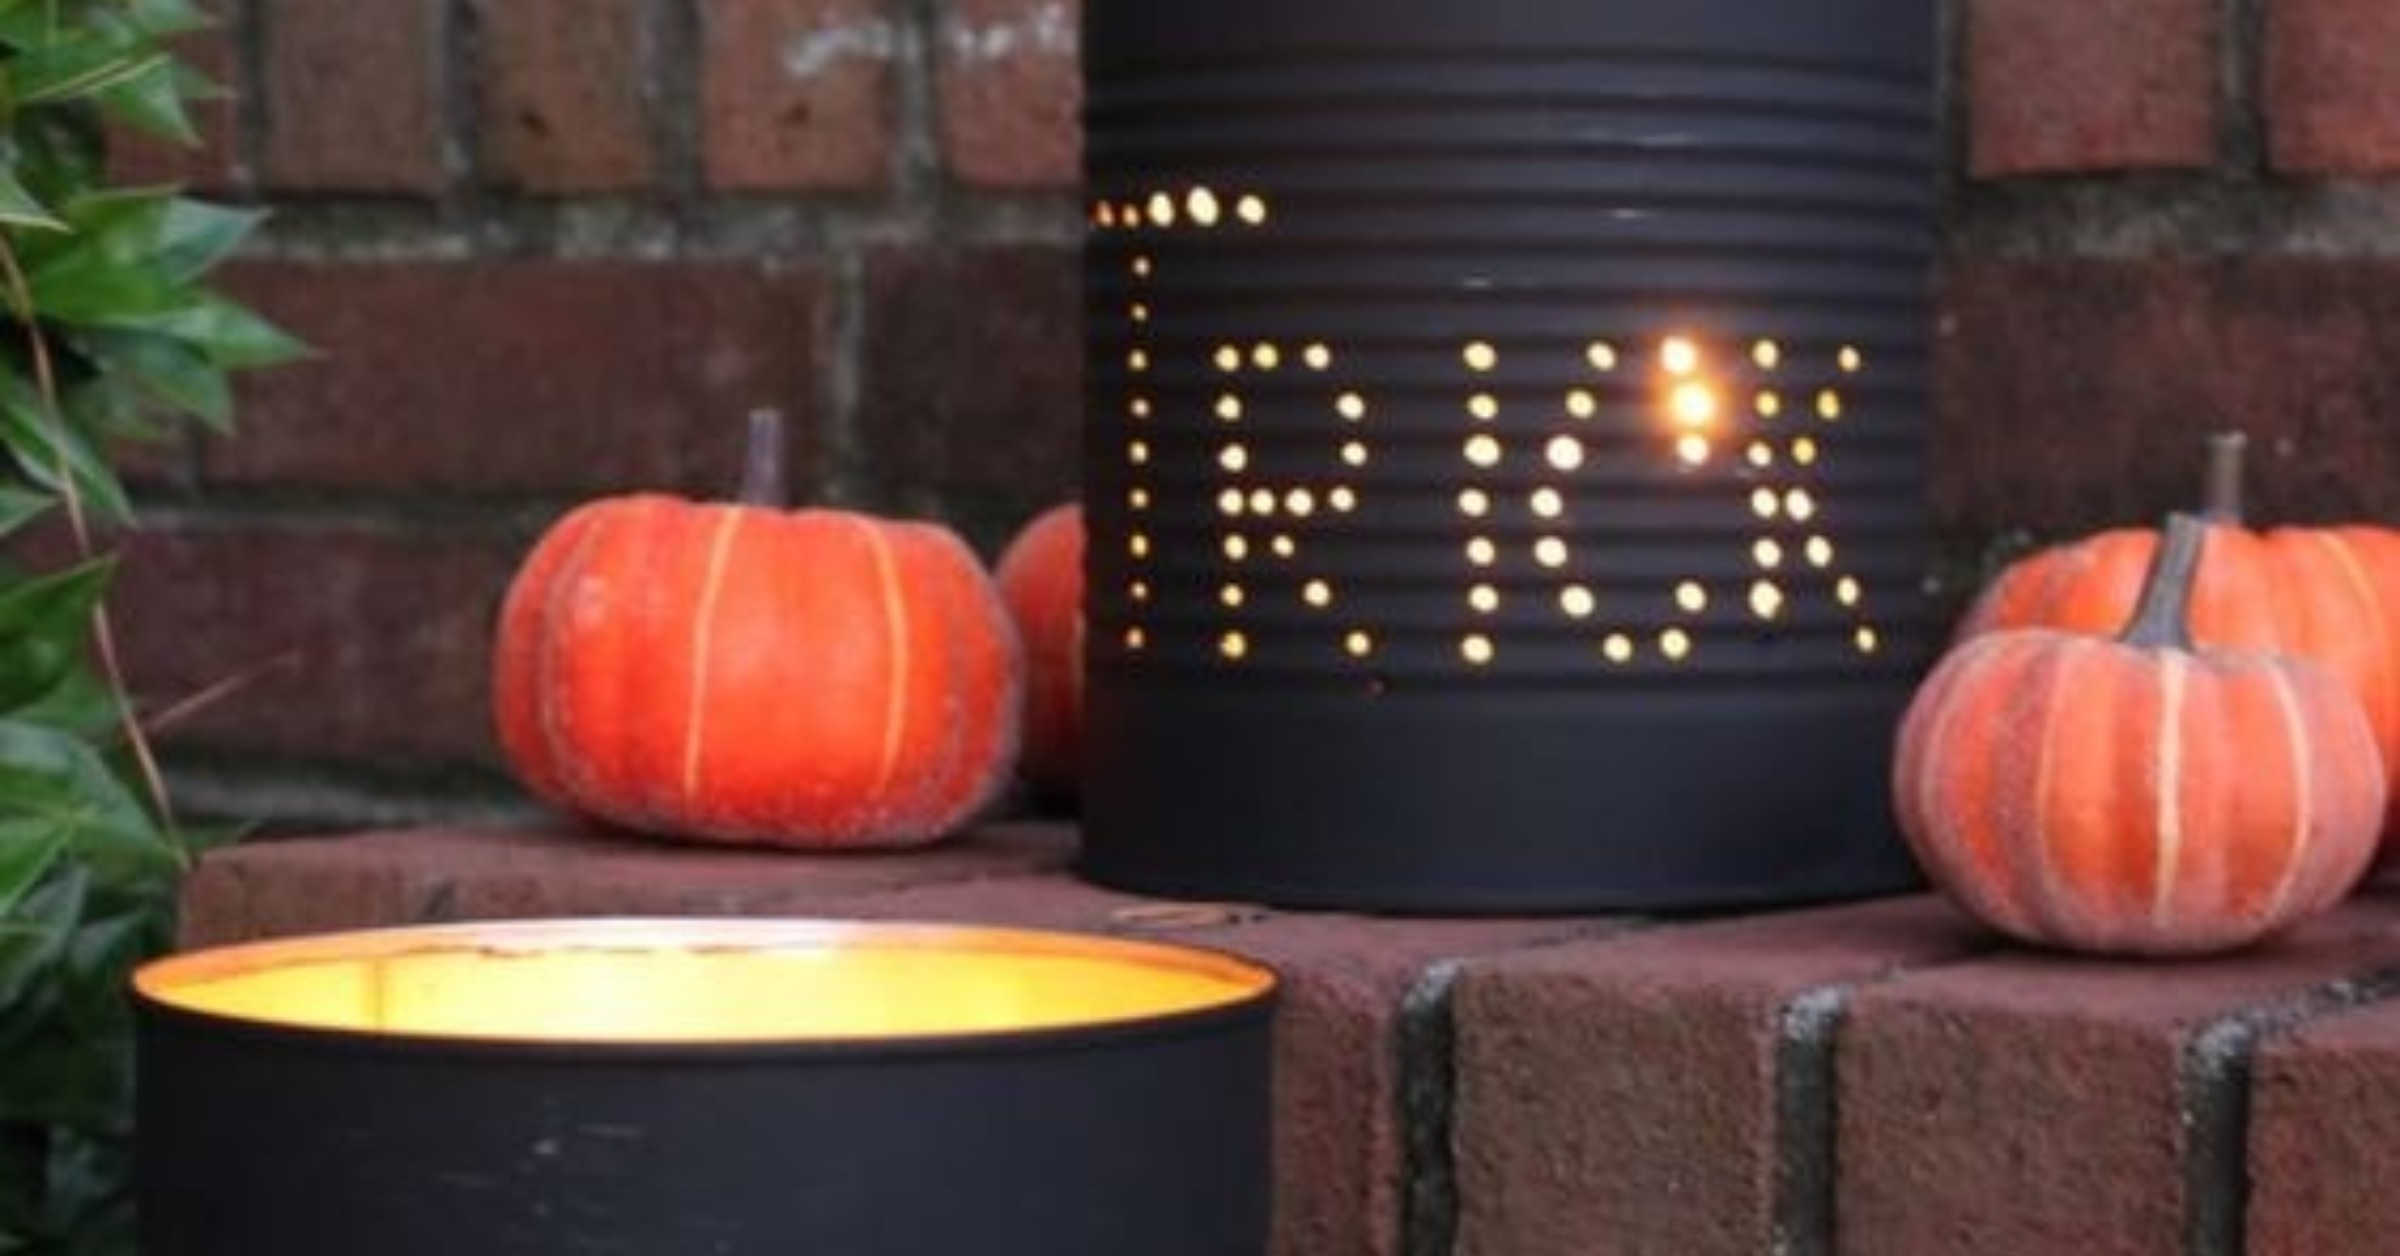 A sustainable Halloween - diy lights